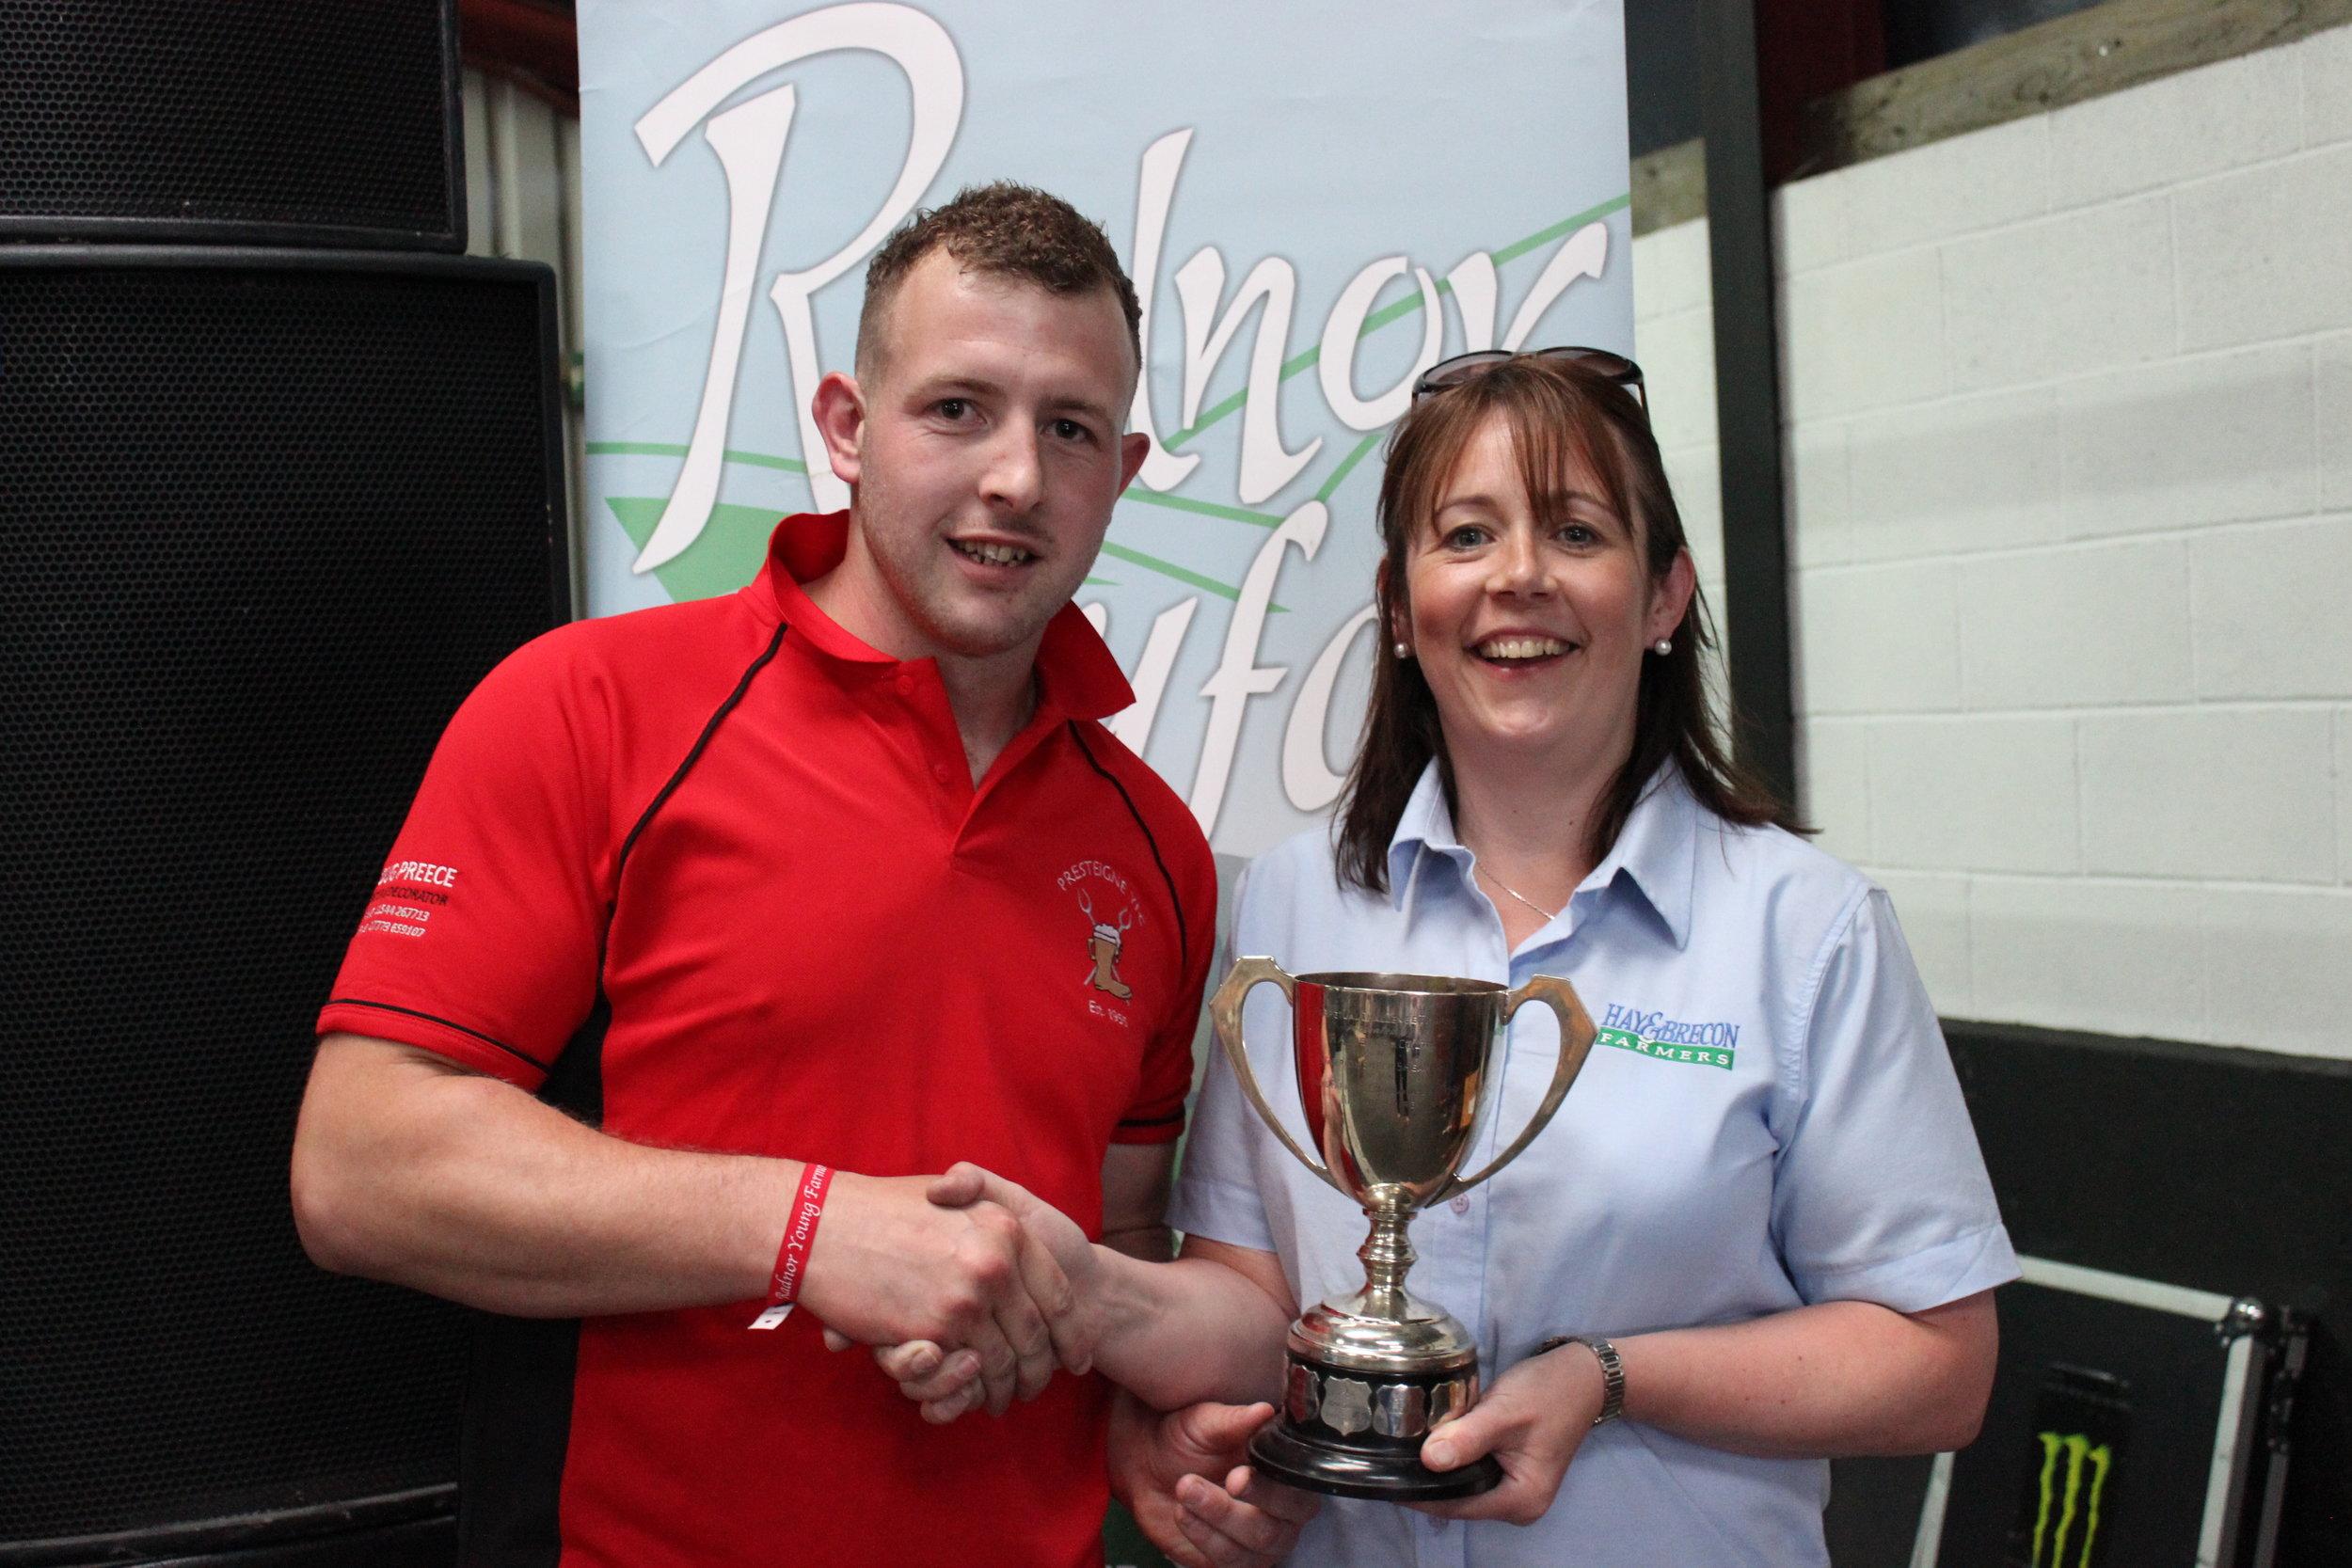 Owen Davies, Presteigne YFC - The RA Lister Trophy - Senior Shearing Competition